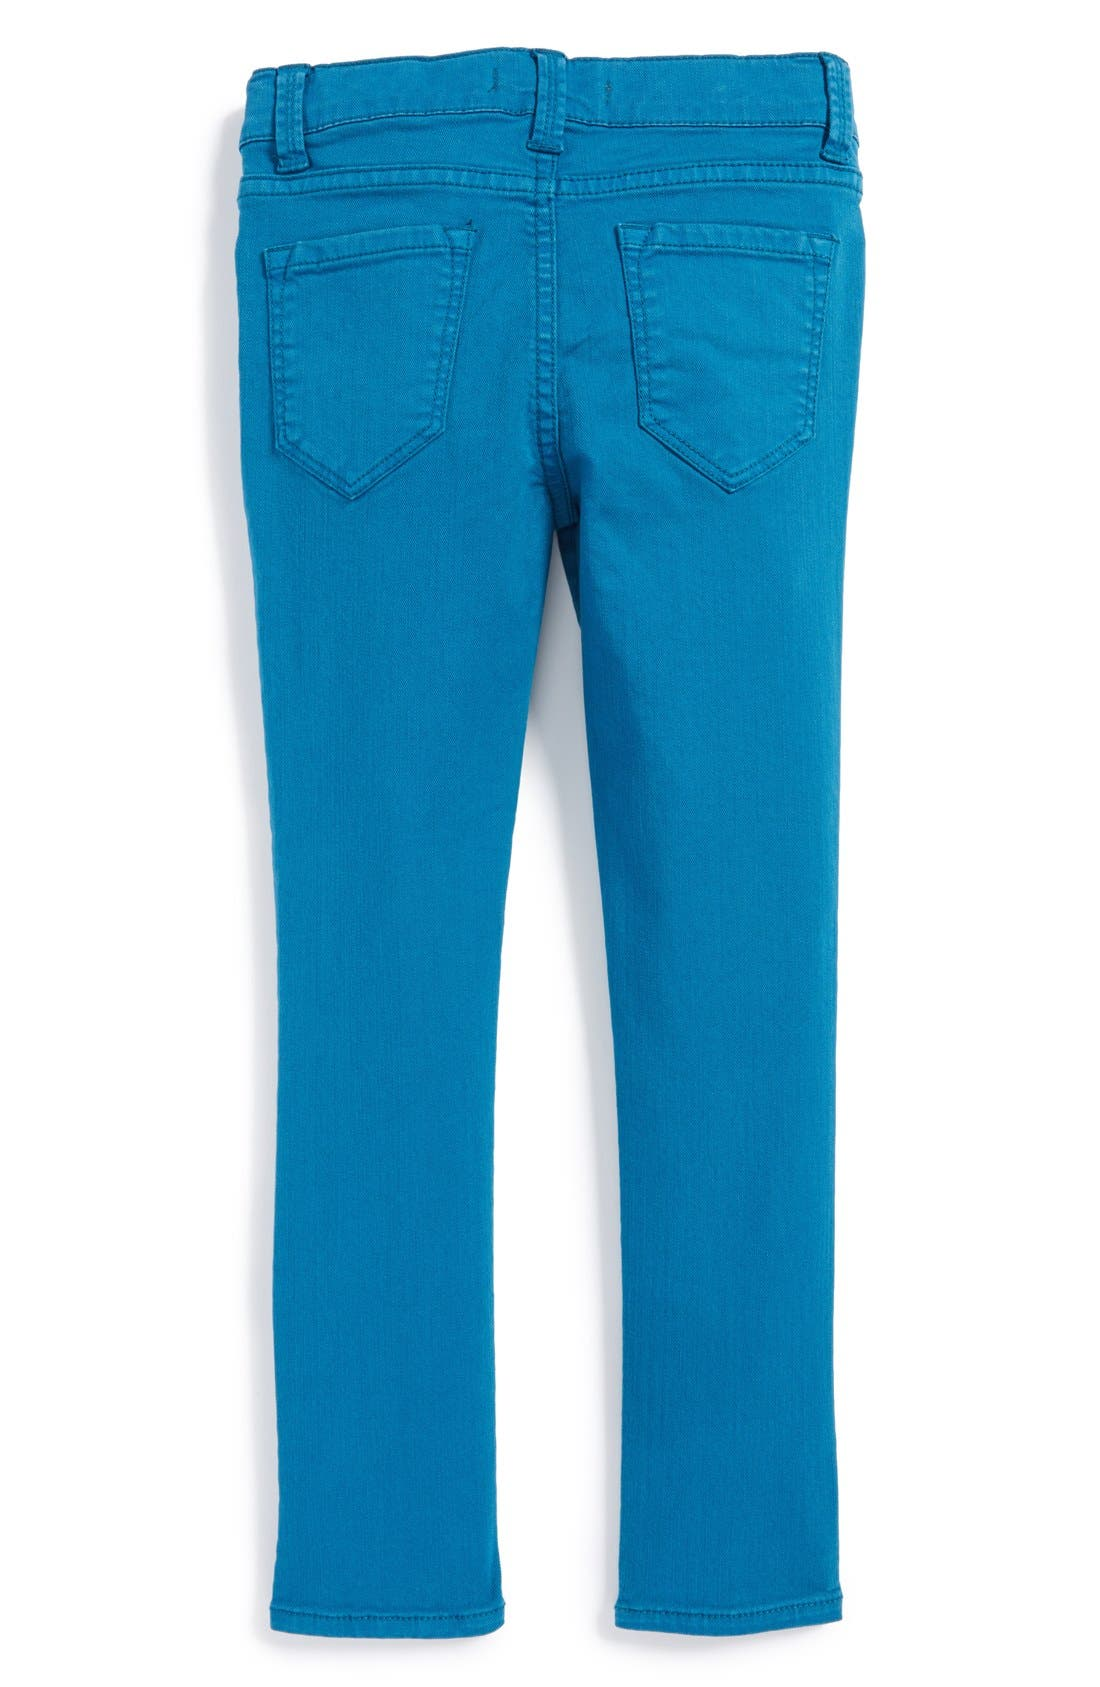 Main Image - Vince 'Riley' Jeans (Big Girls)